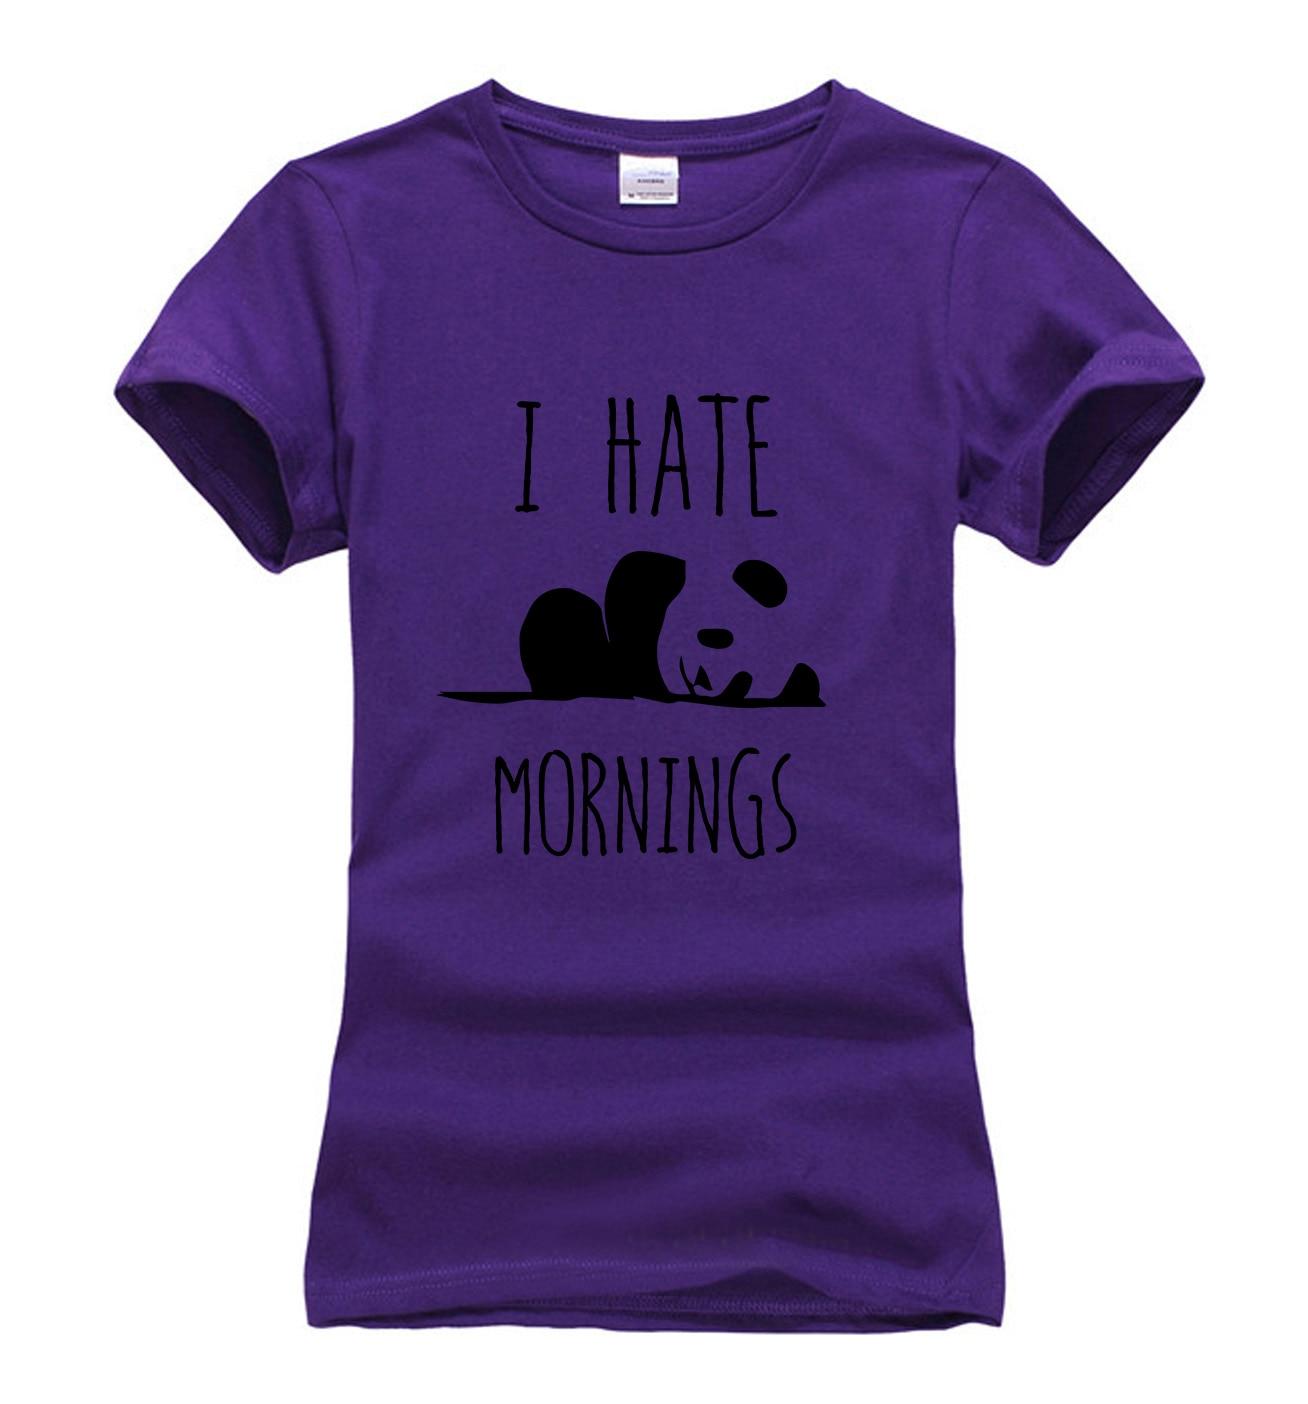 Black t shirt grunge - 2017 Summer I Hate Mornings Panda Print T Shirt Women Brand Tops Harajuku Tee Pink Shirt